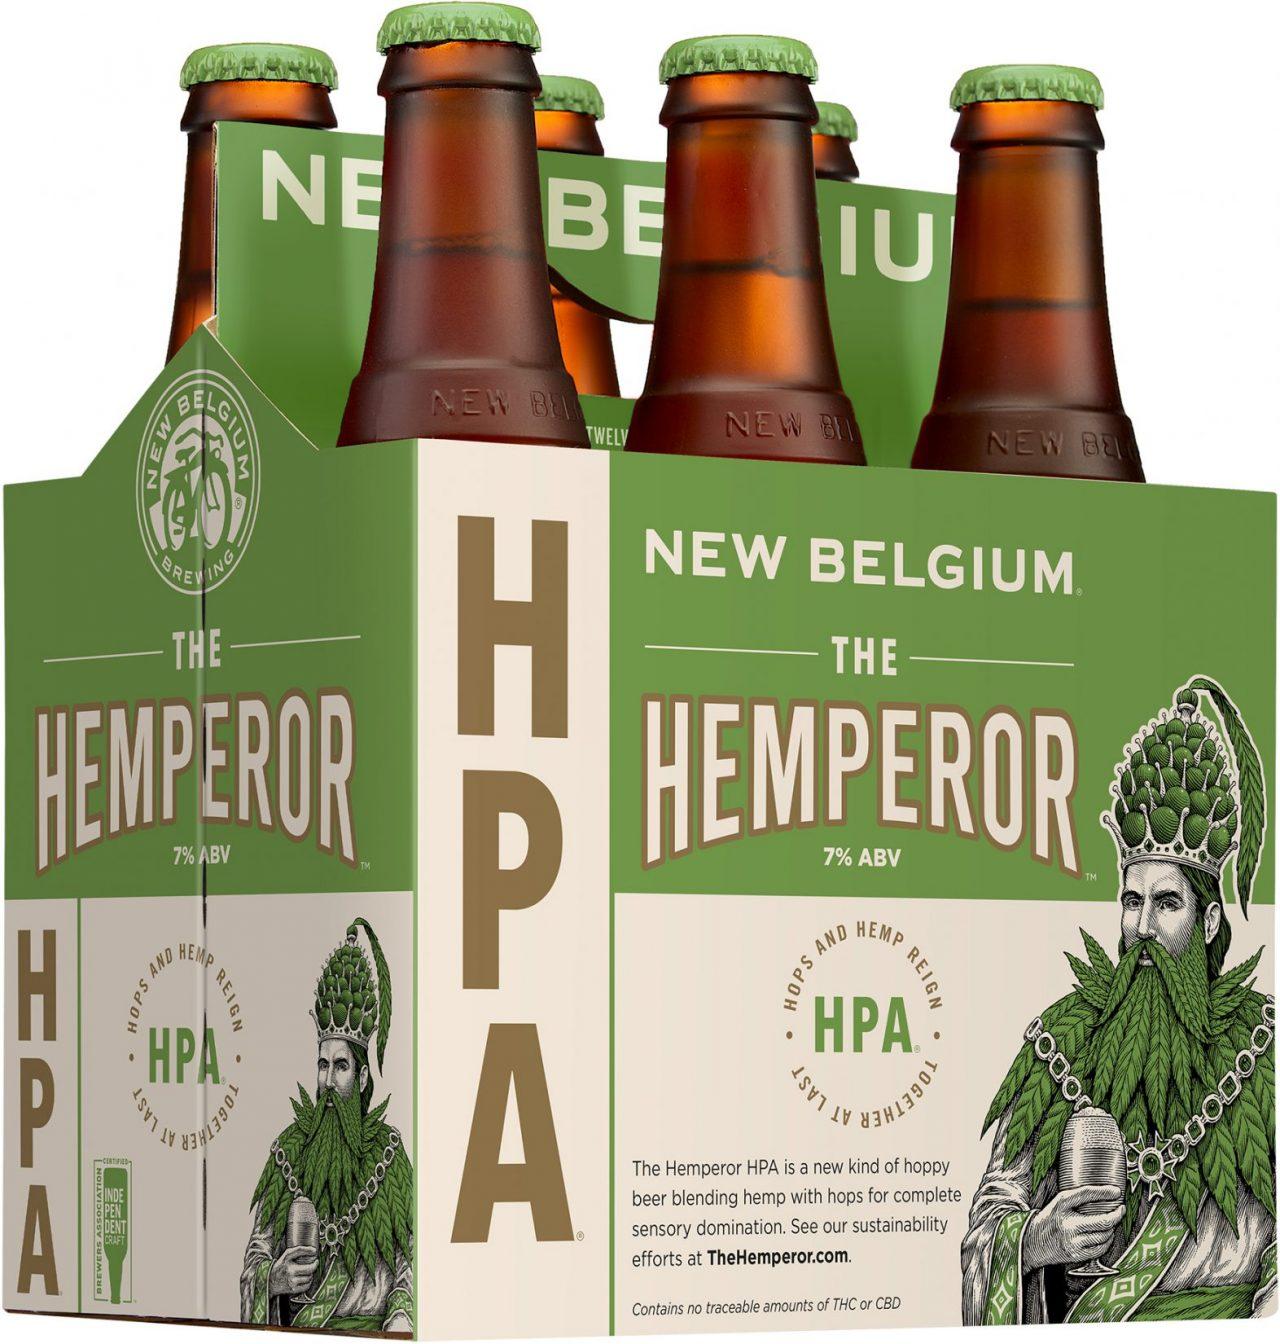 The_Hemperor_HPA_12_oz_6_pack_bottle_side_angle-1280x1344.jpg